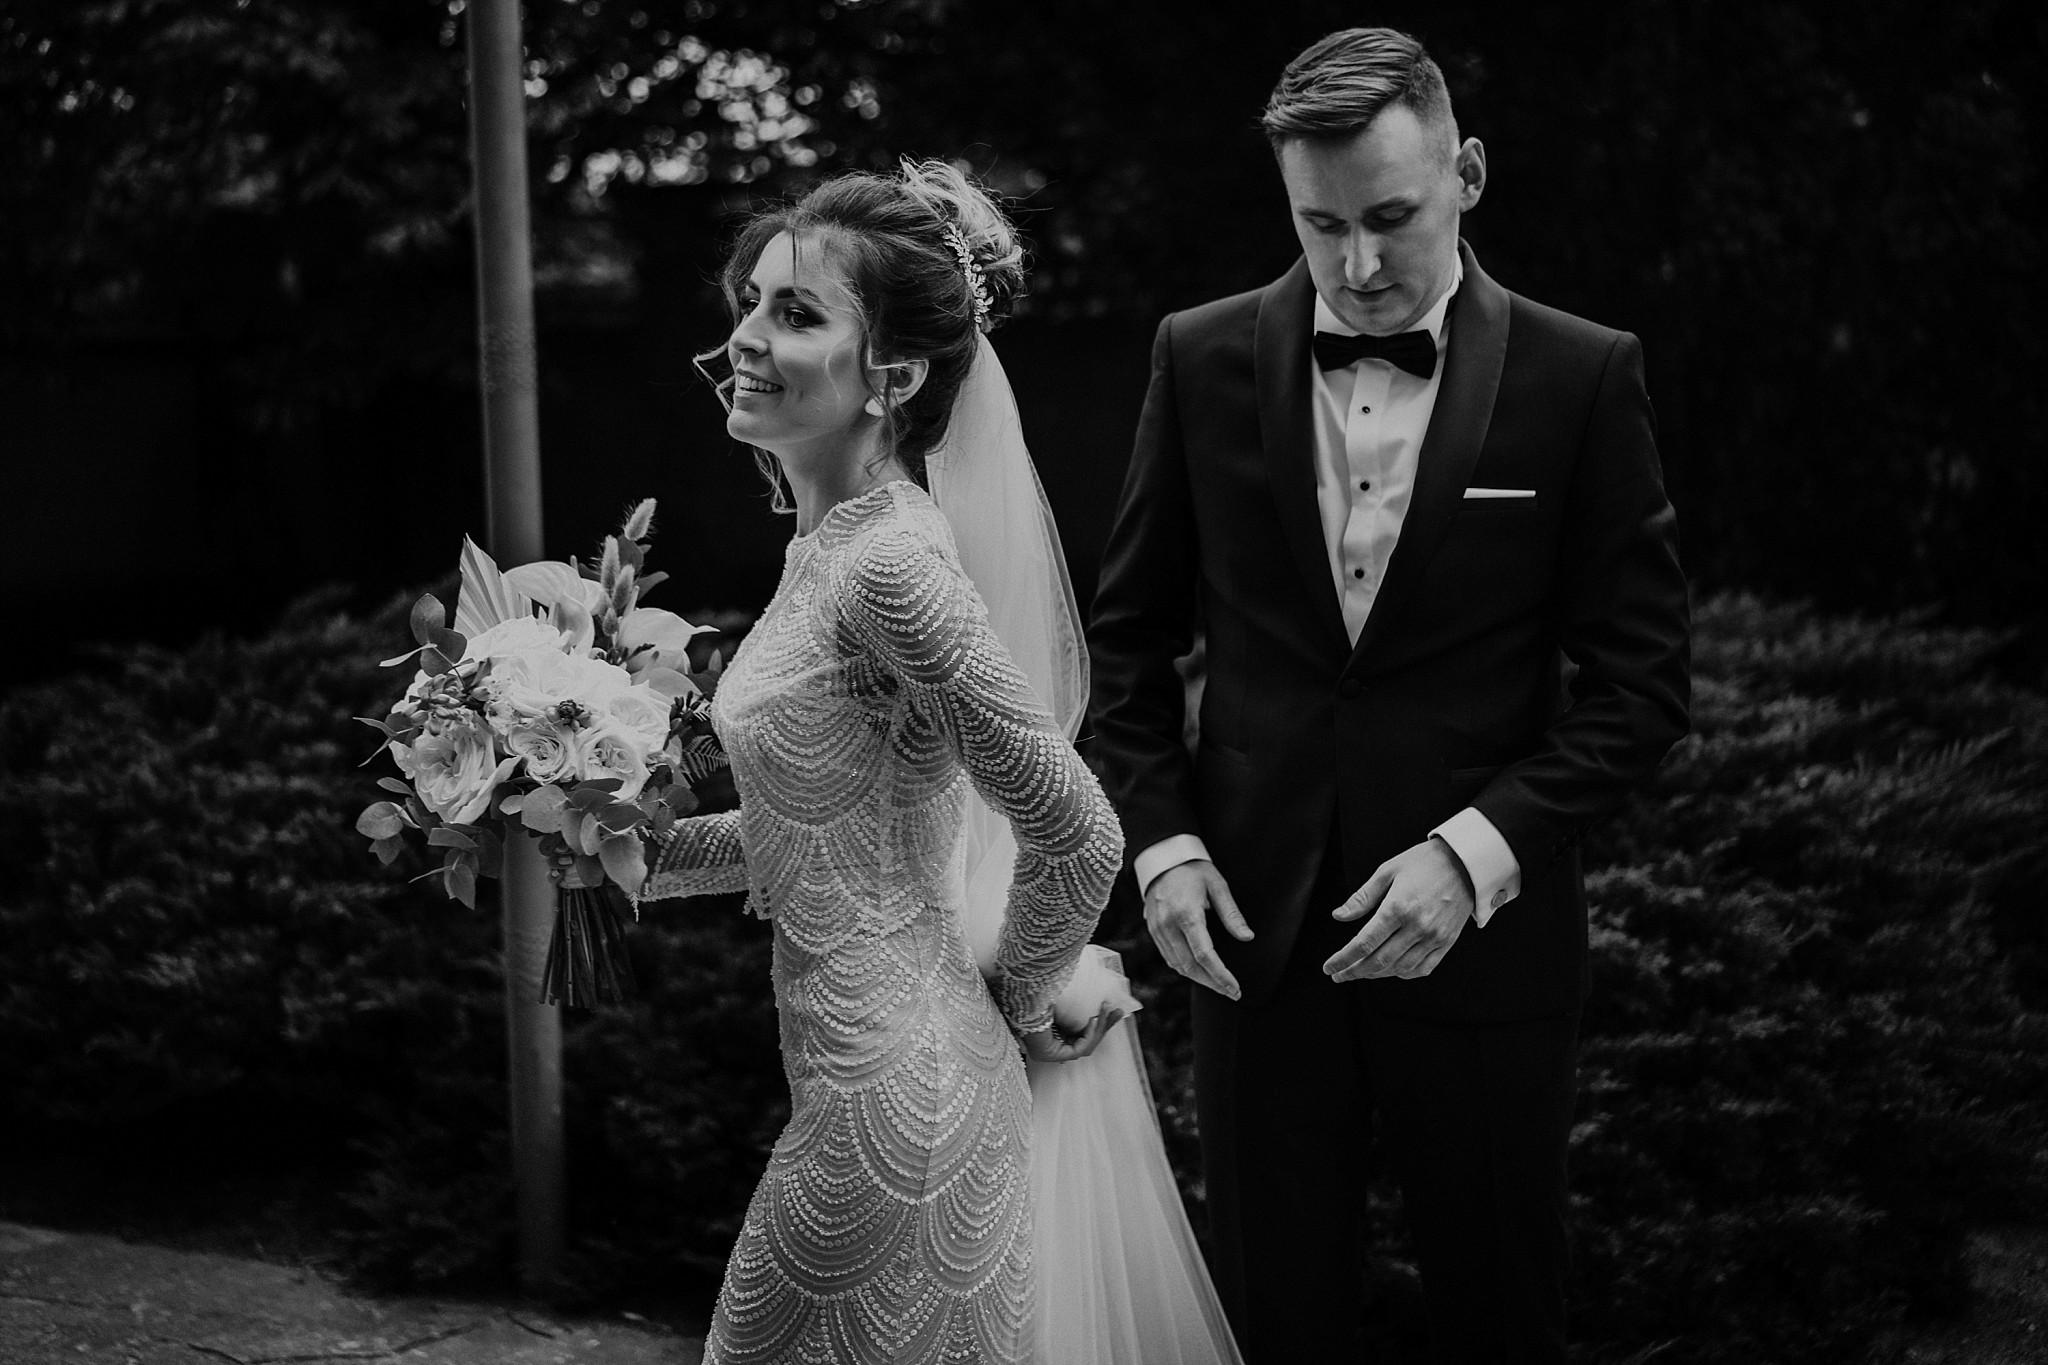 fotograf poznan wesele dobra truskawka piekne wesele pod poznaniem wesele w dobrej truskawce piekna para mloda slub marzen slub koronawirus slub listopad wesele koronawirus 127